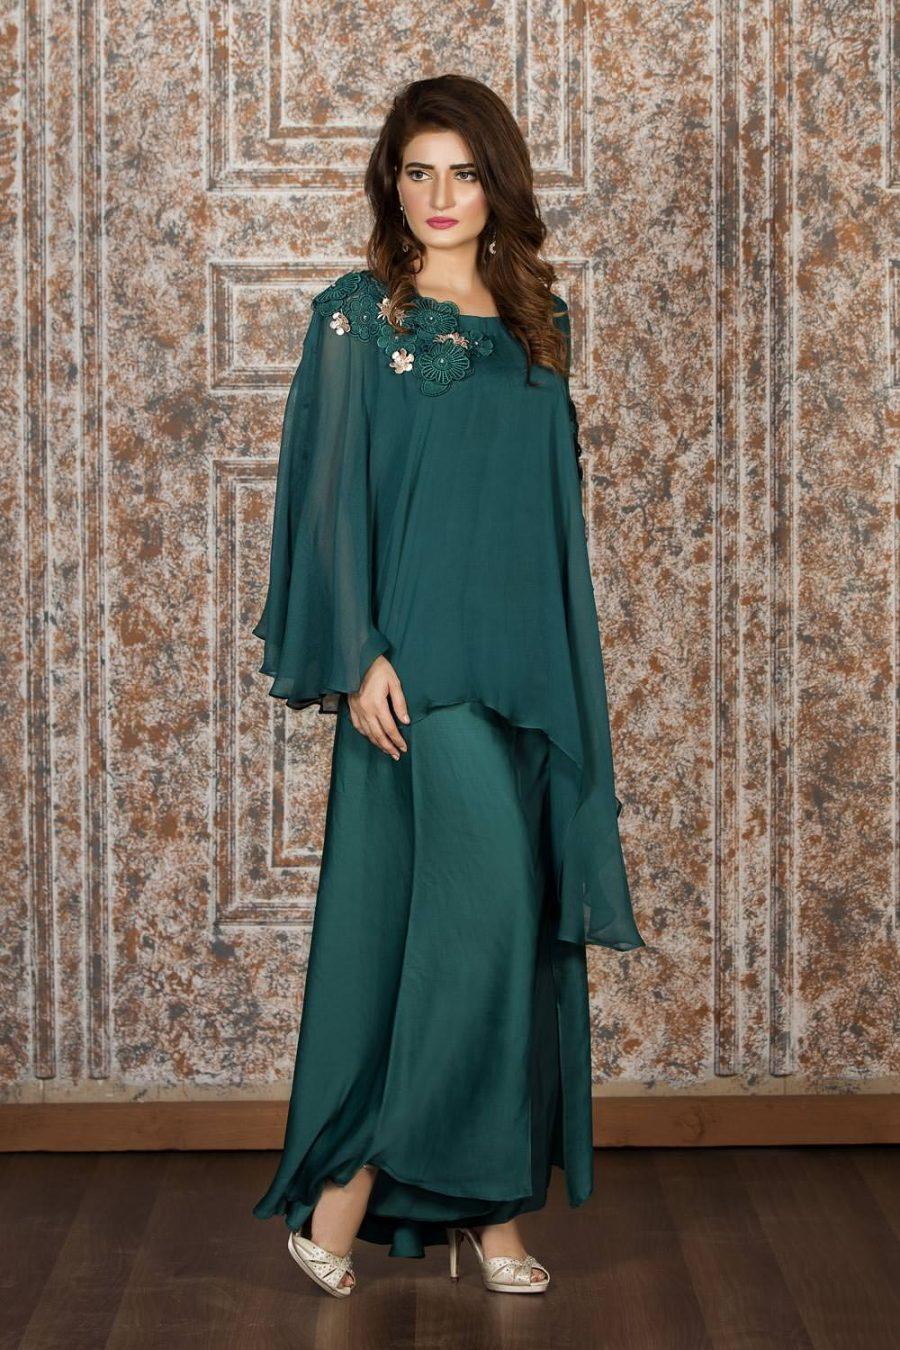 Exclusive Emerald Green Casual Wear Sac2204 Exclusive